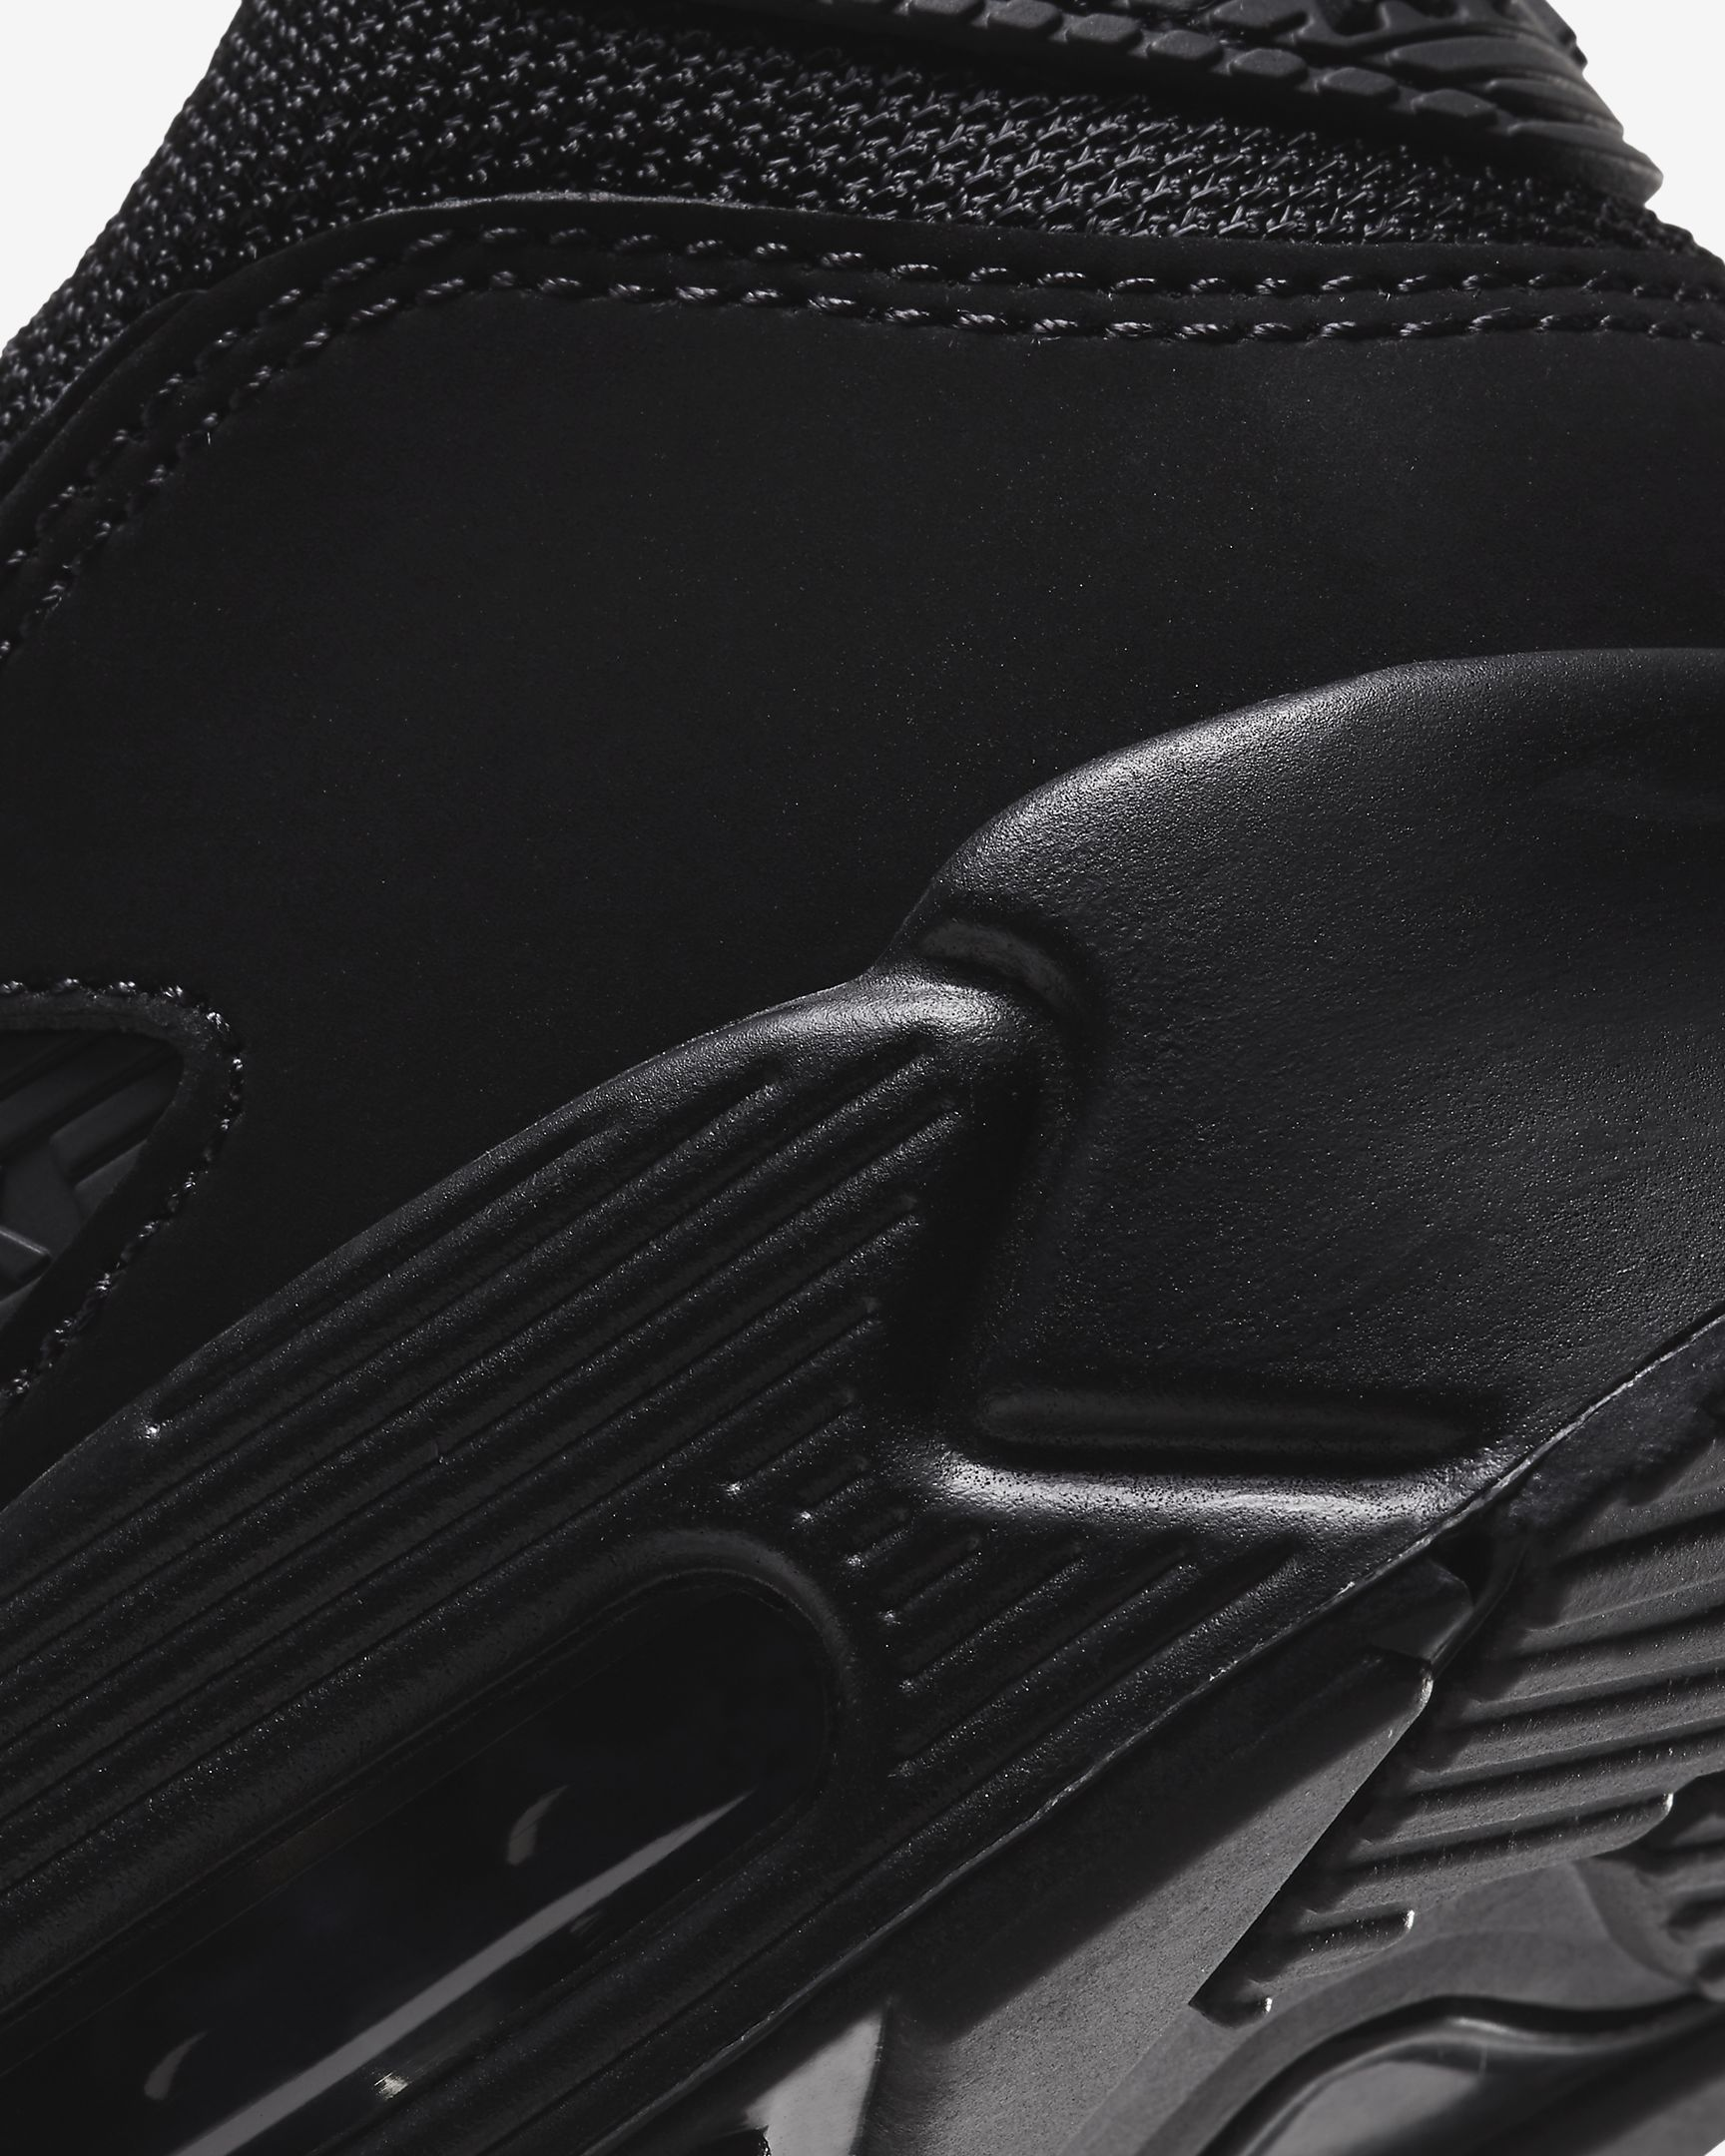 Tenisky Nike Air Max 90 Essential Látkové Čierne-WWW.AIRFORCE.SK